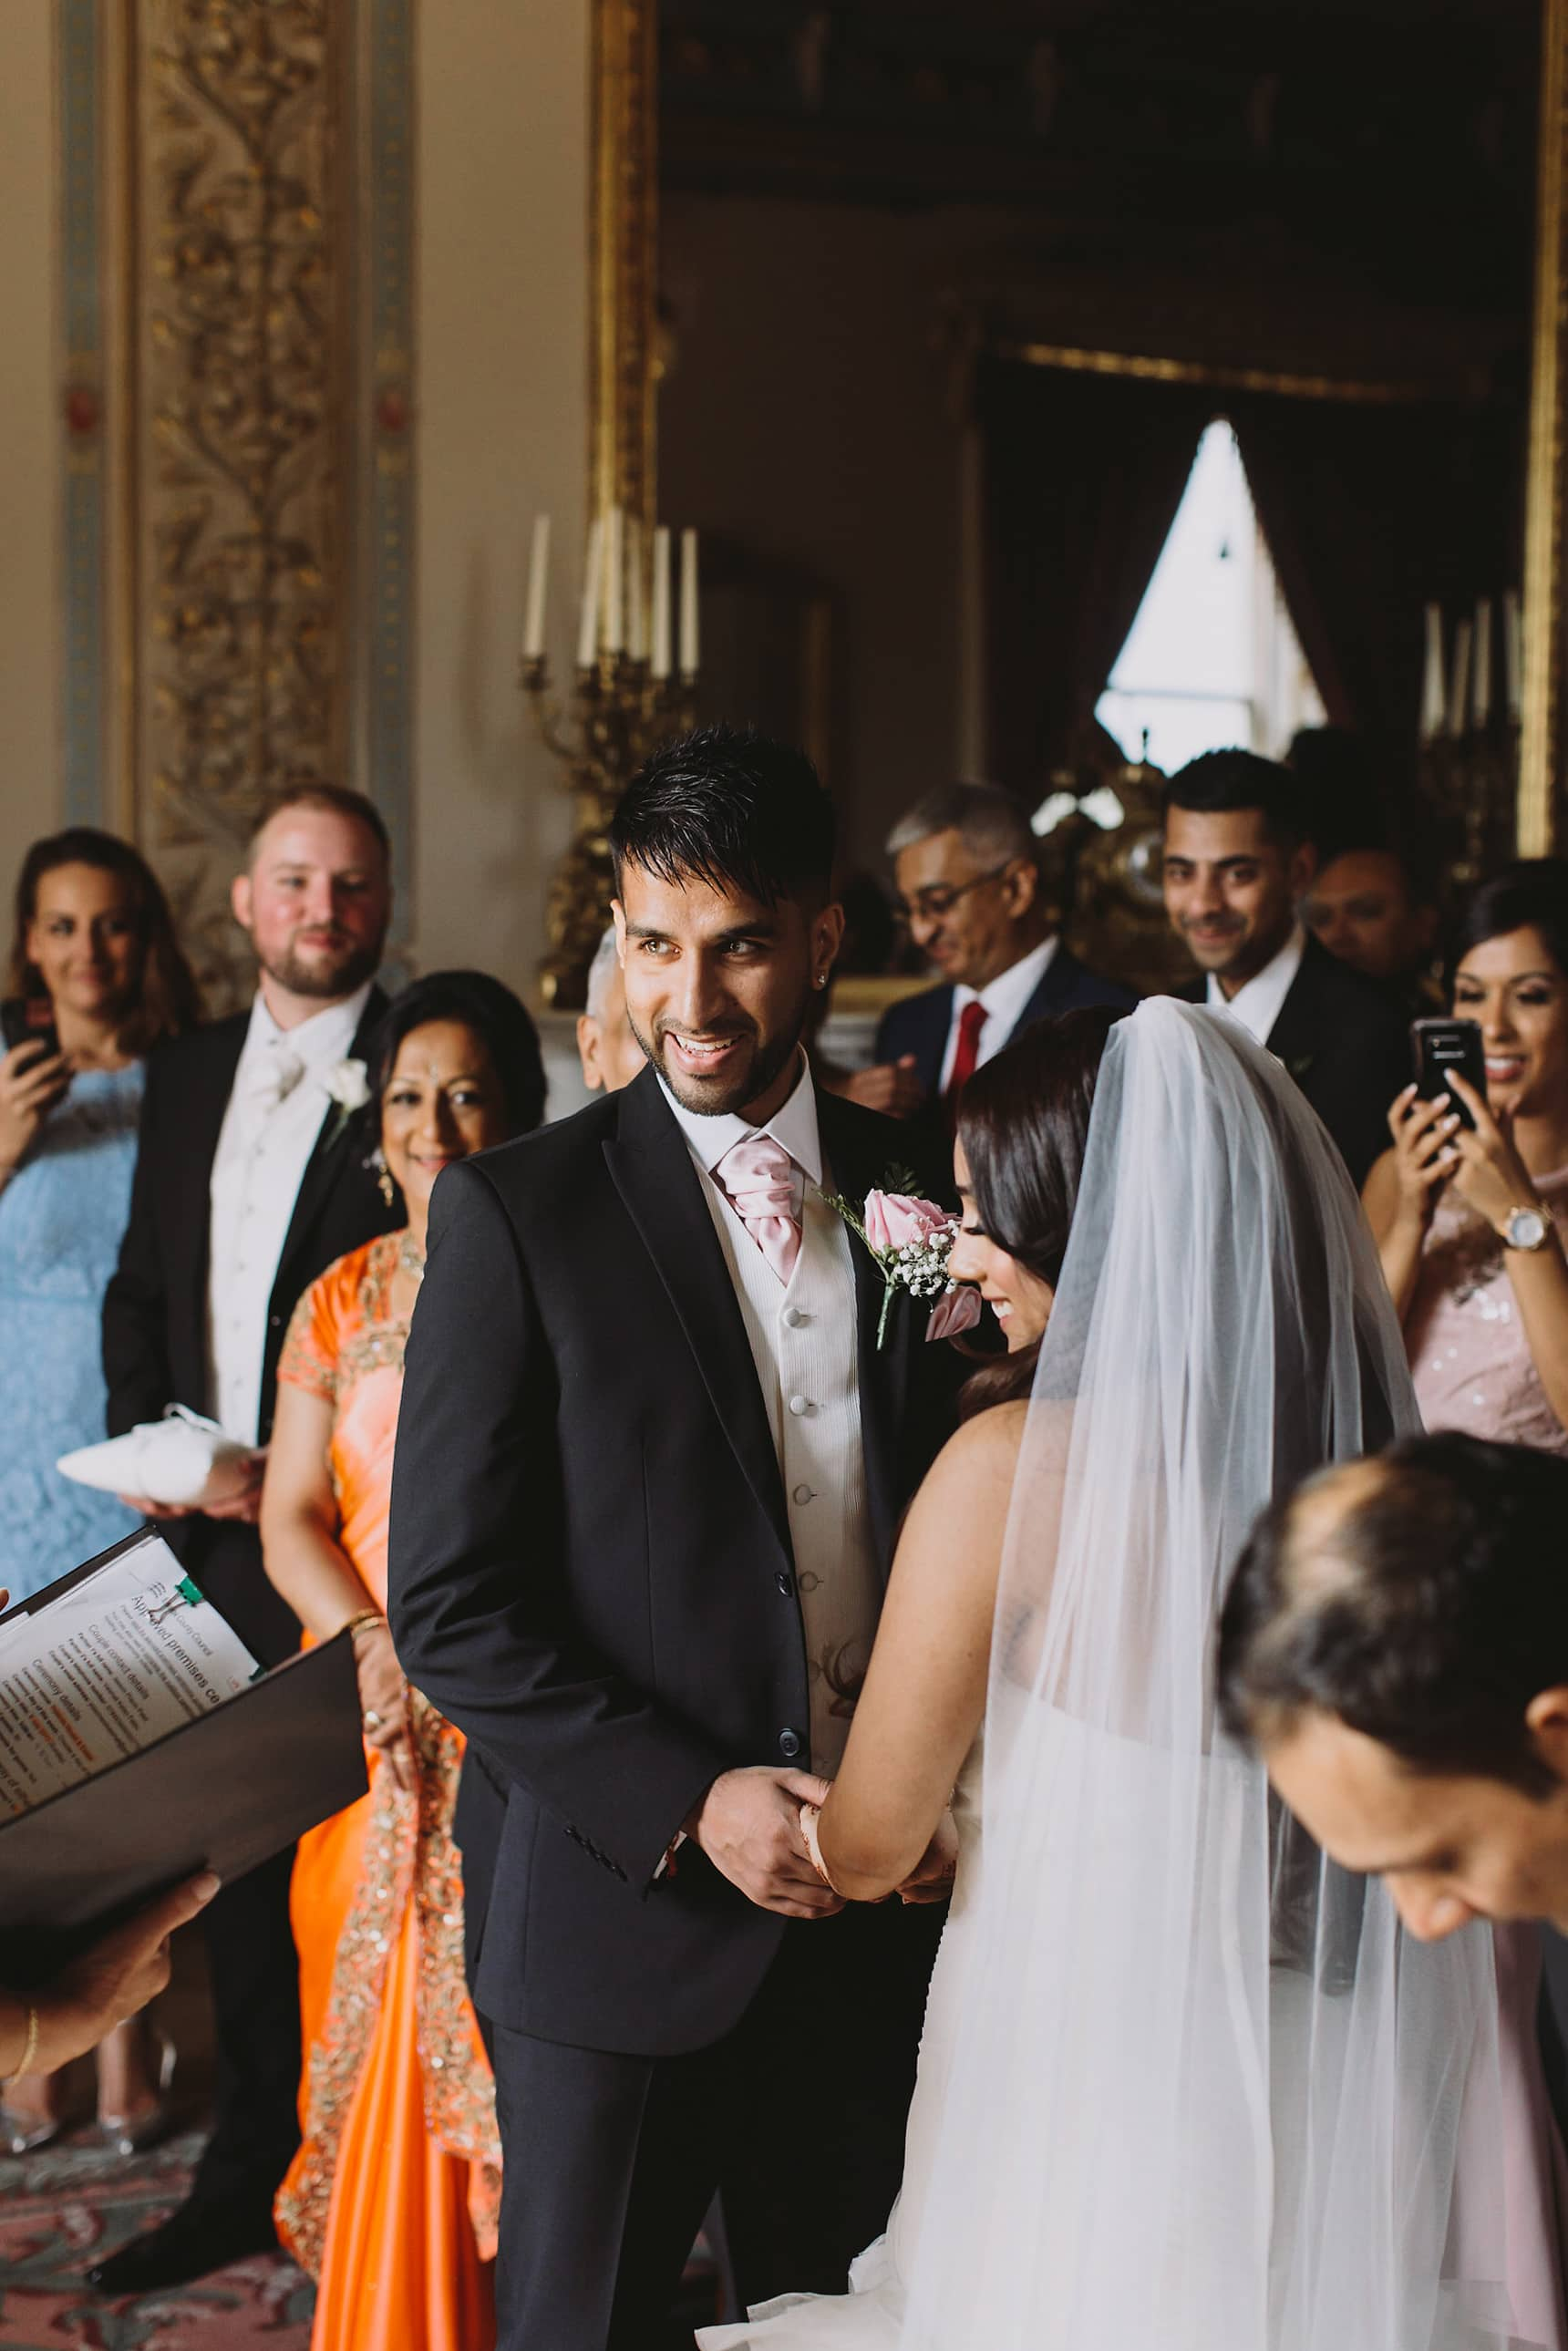 hylands house wedding photography